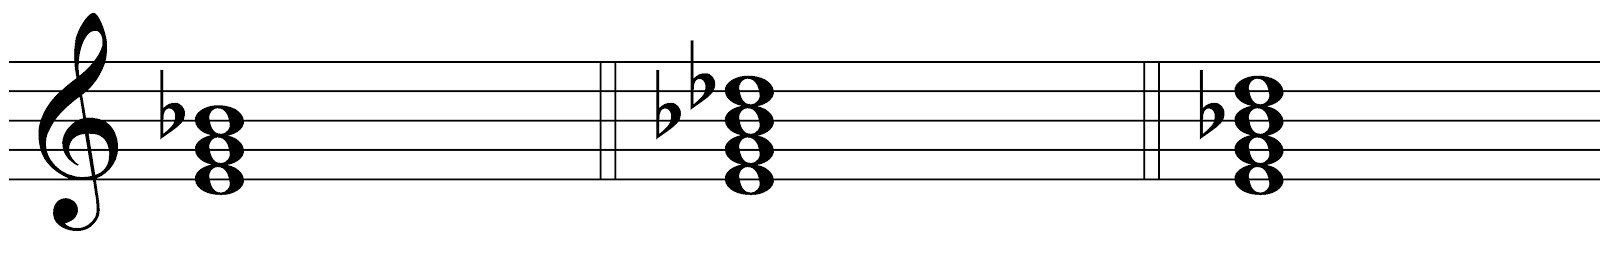 Diminished chords yallemedia.jpg